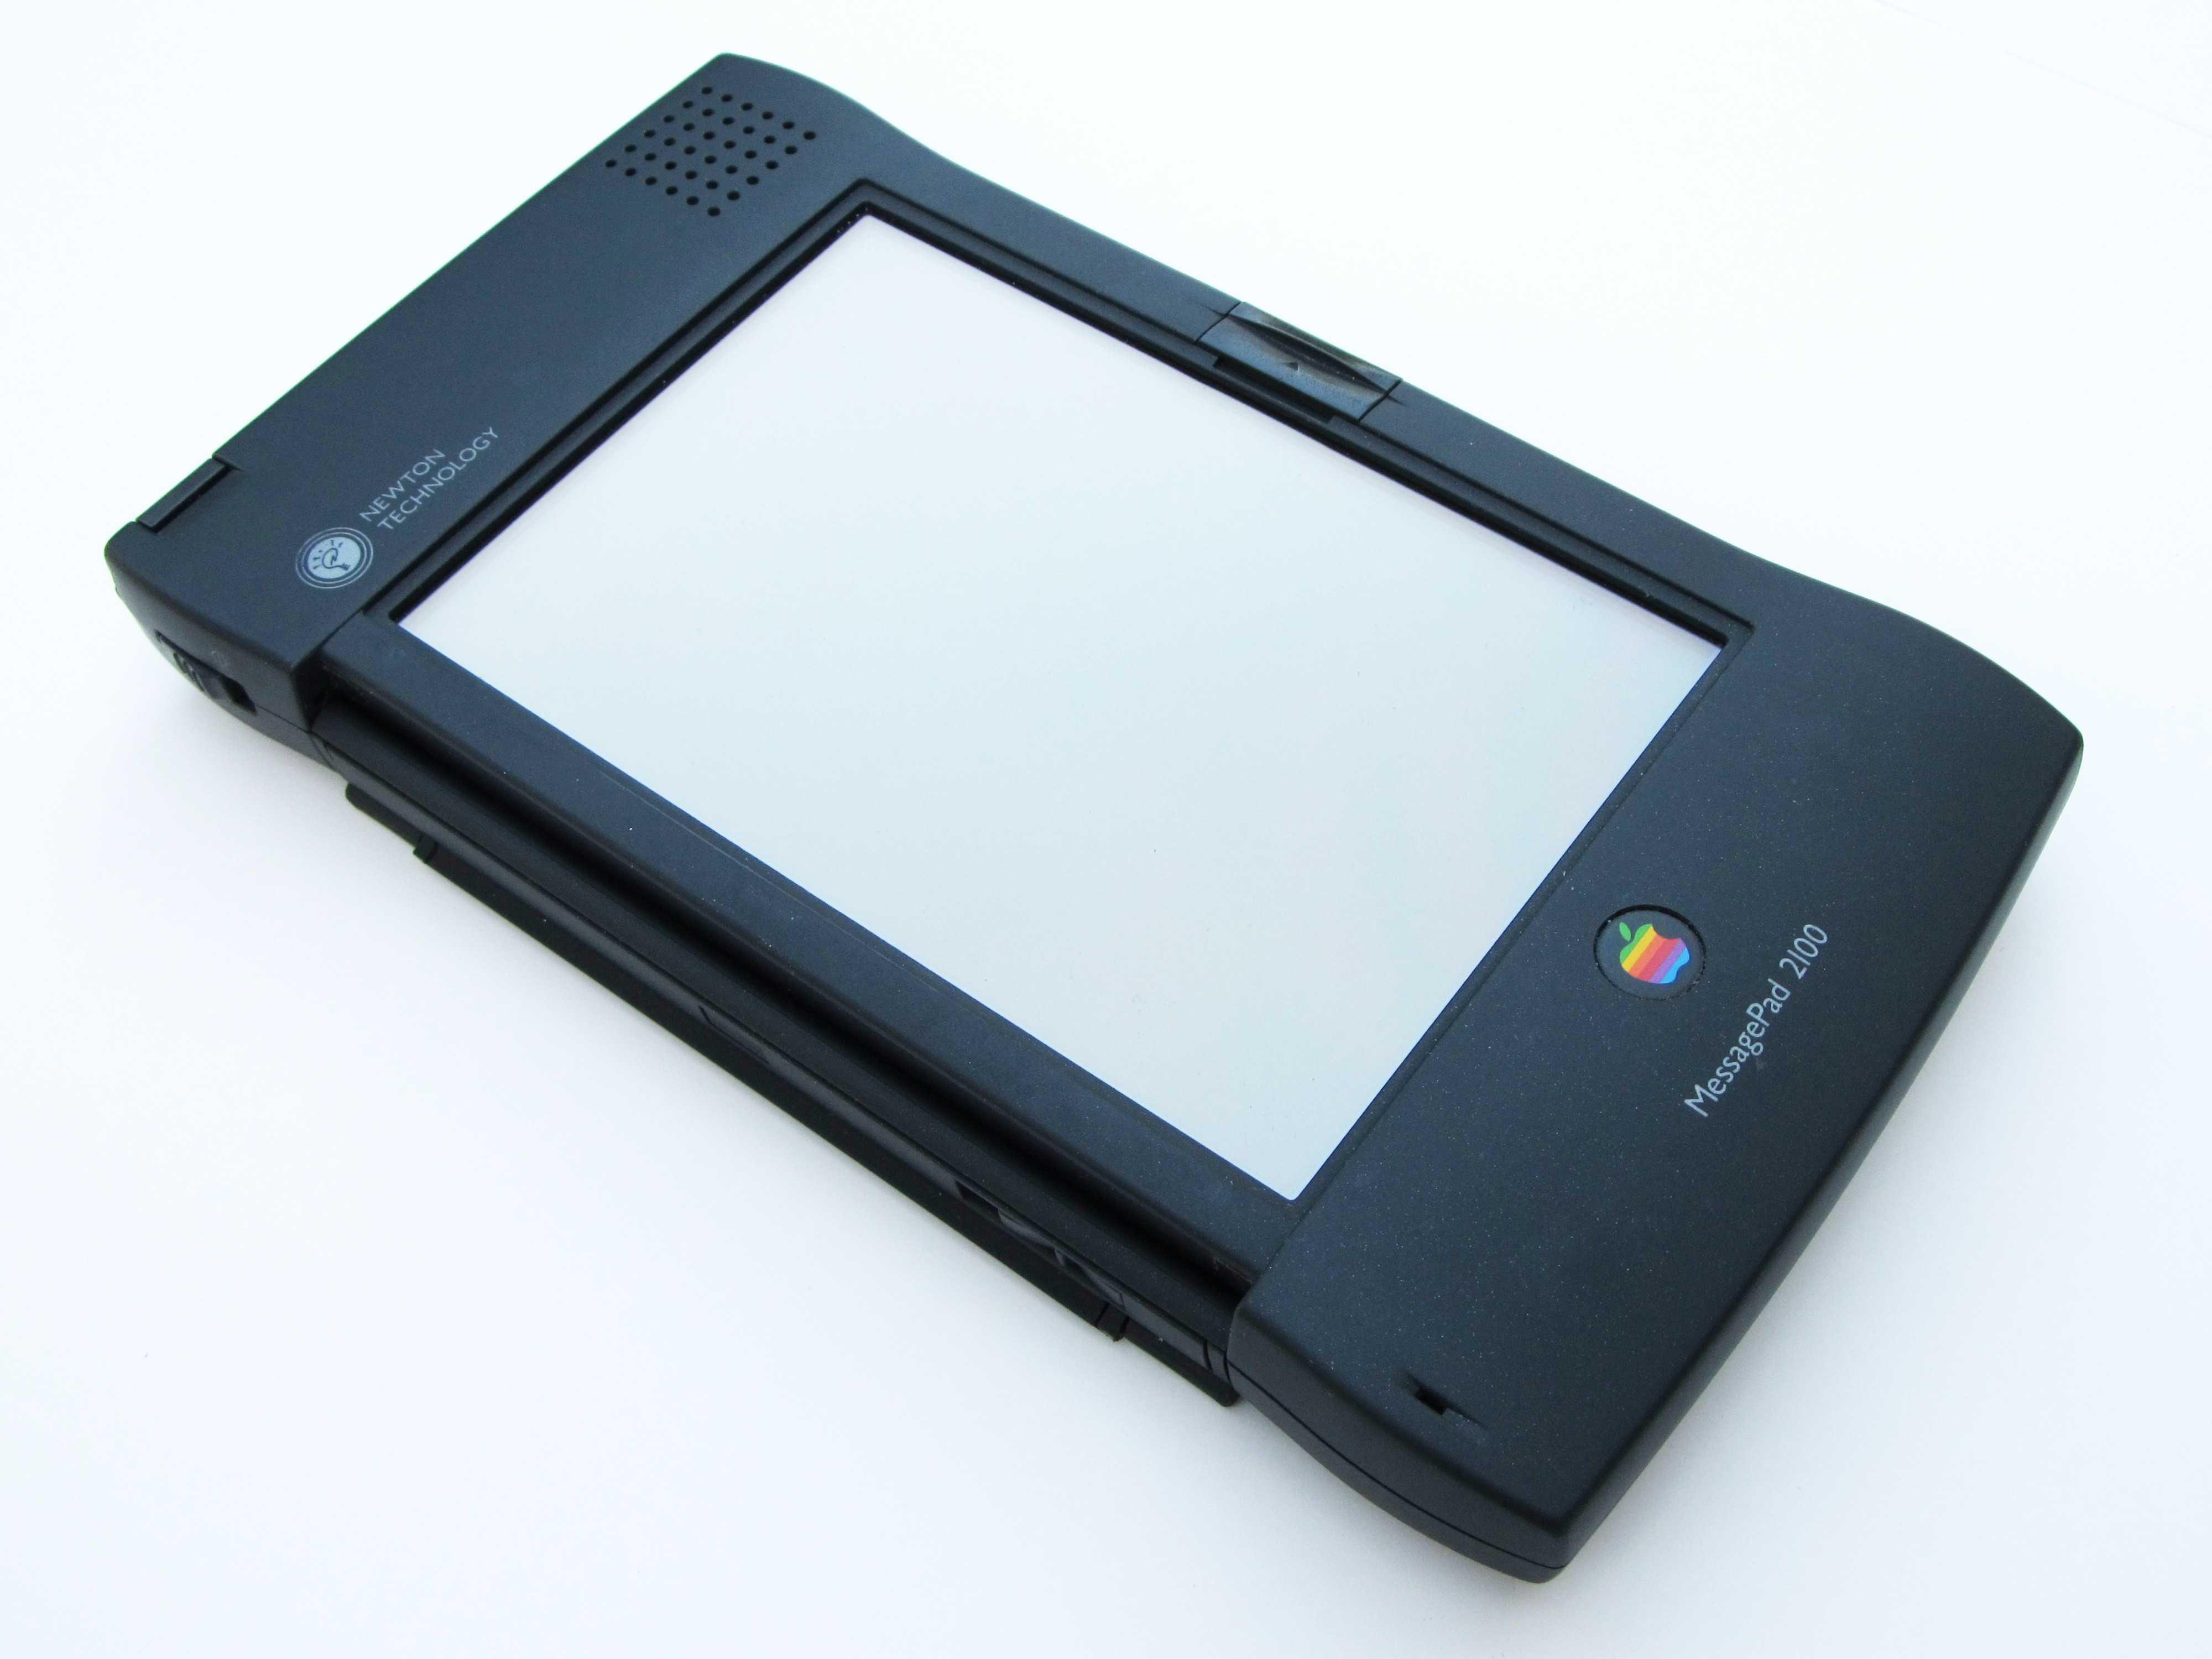 The Newton MessagePad 2100 was the last hurrah for Apple's Newton line.